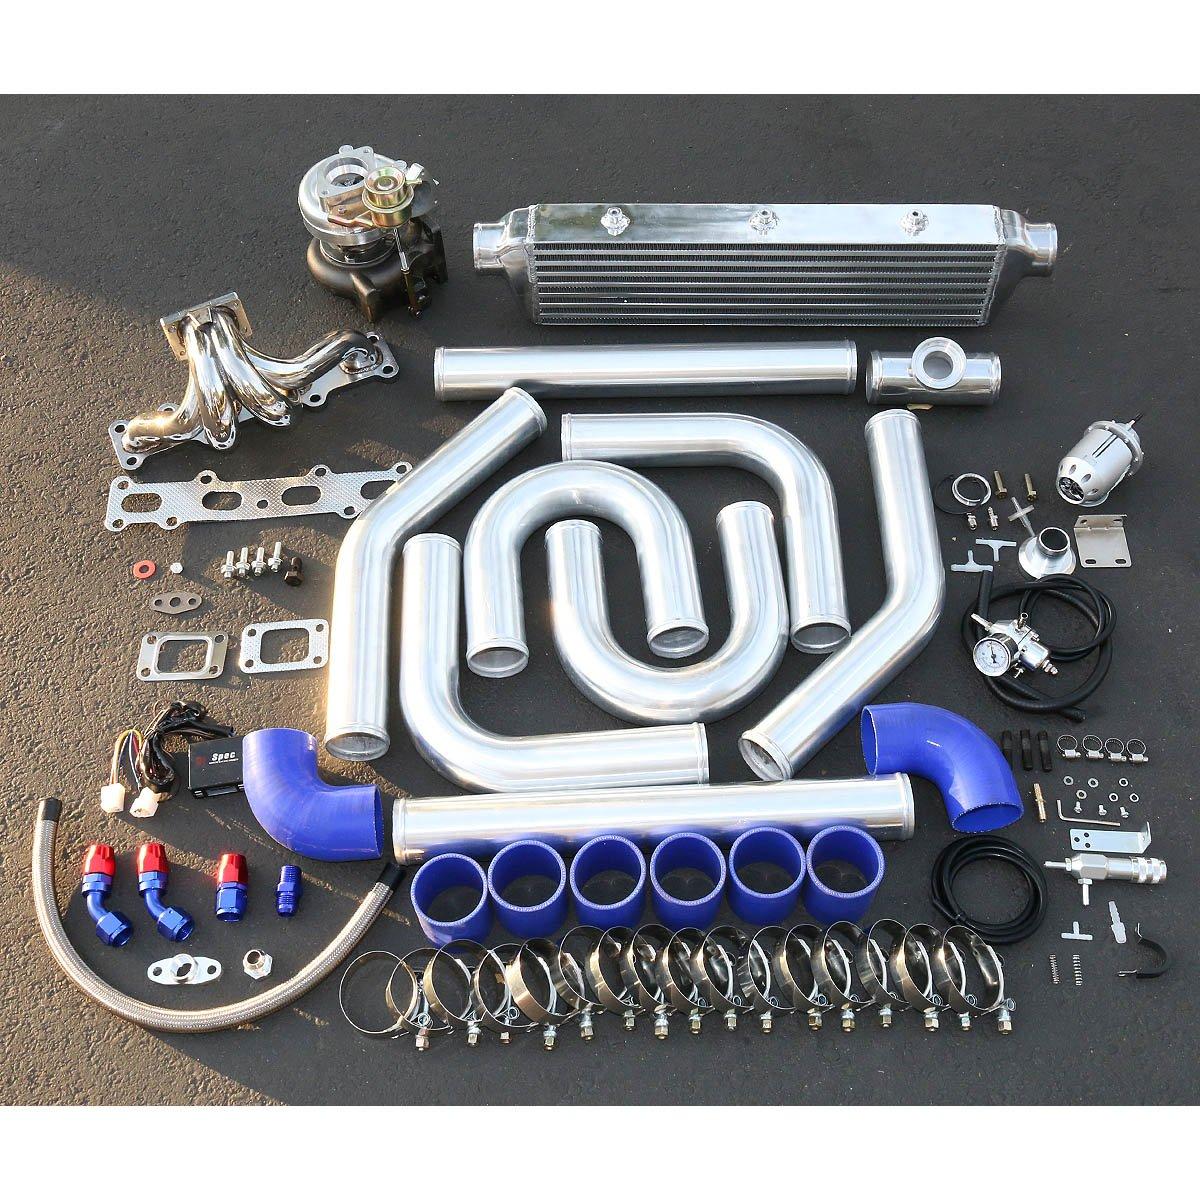 Amazon.com: For Mazda Miata 1.8L High Performance 10pcs T25 Turbo Upgrade Installation Kit: Automotive